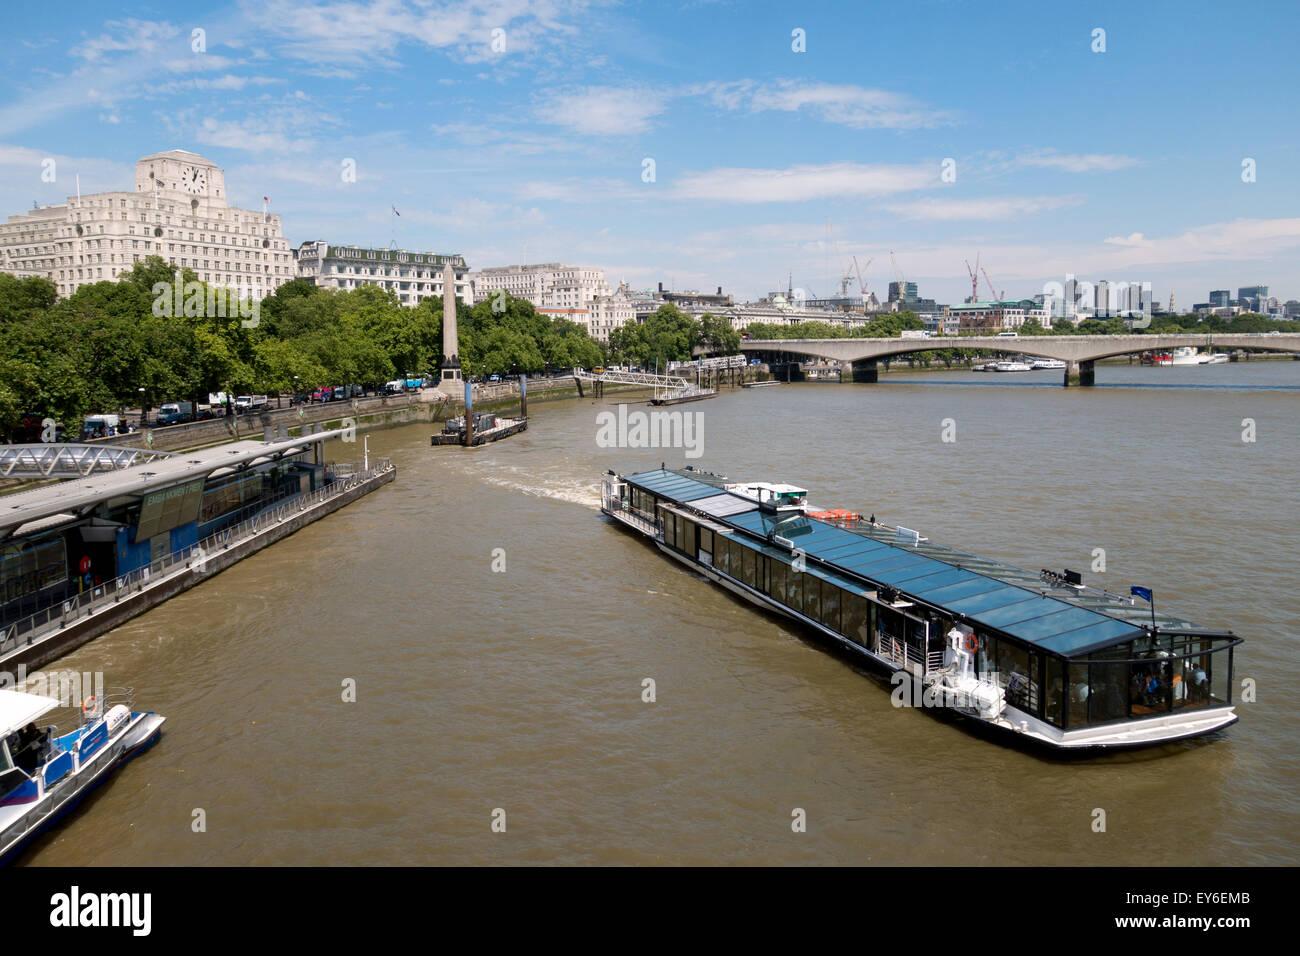 A tourist sightseeing boat leaving Embankment Pier, River Thames, London UK - Stock Image